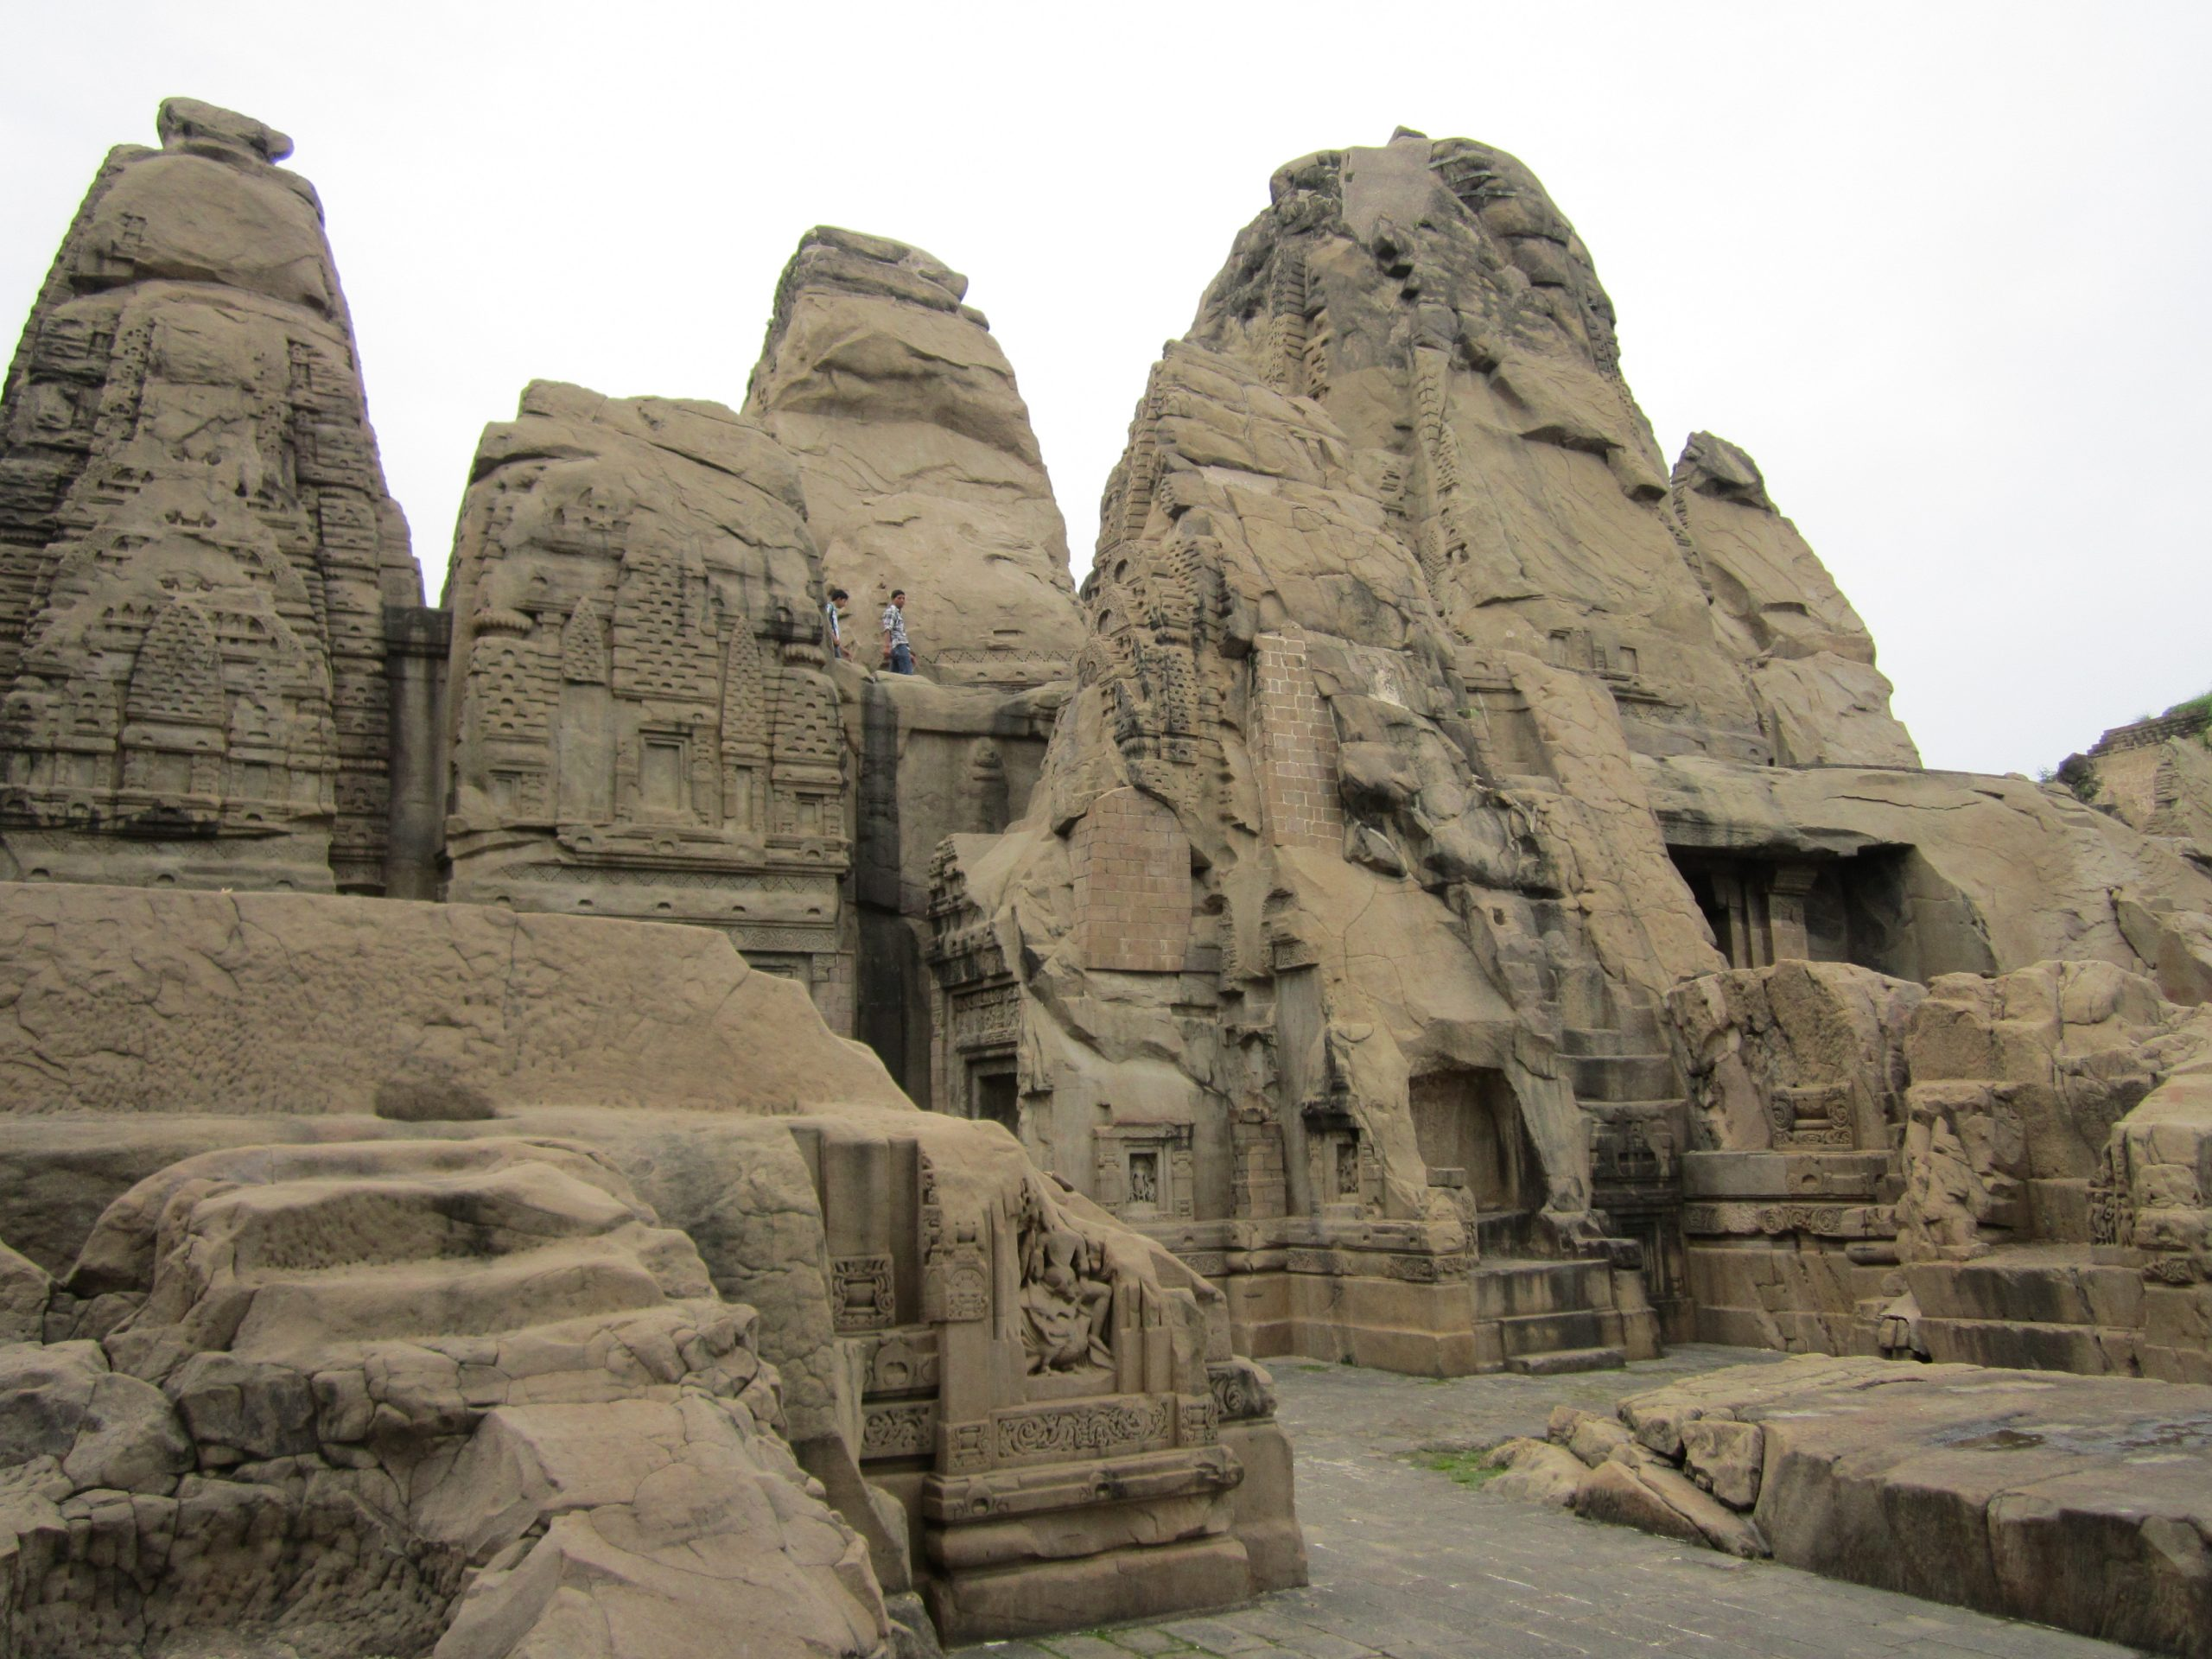 Masrur Rock Cut Temple - Must-Visit Place in Dharamshala and McLeodganj